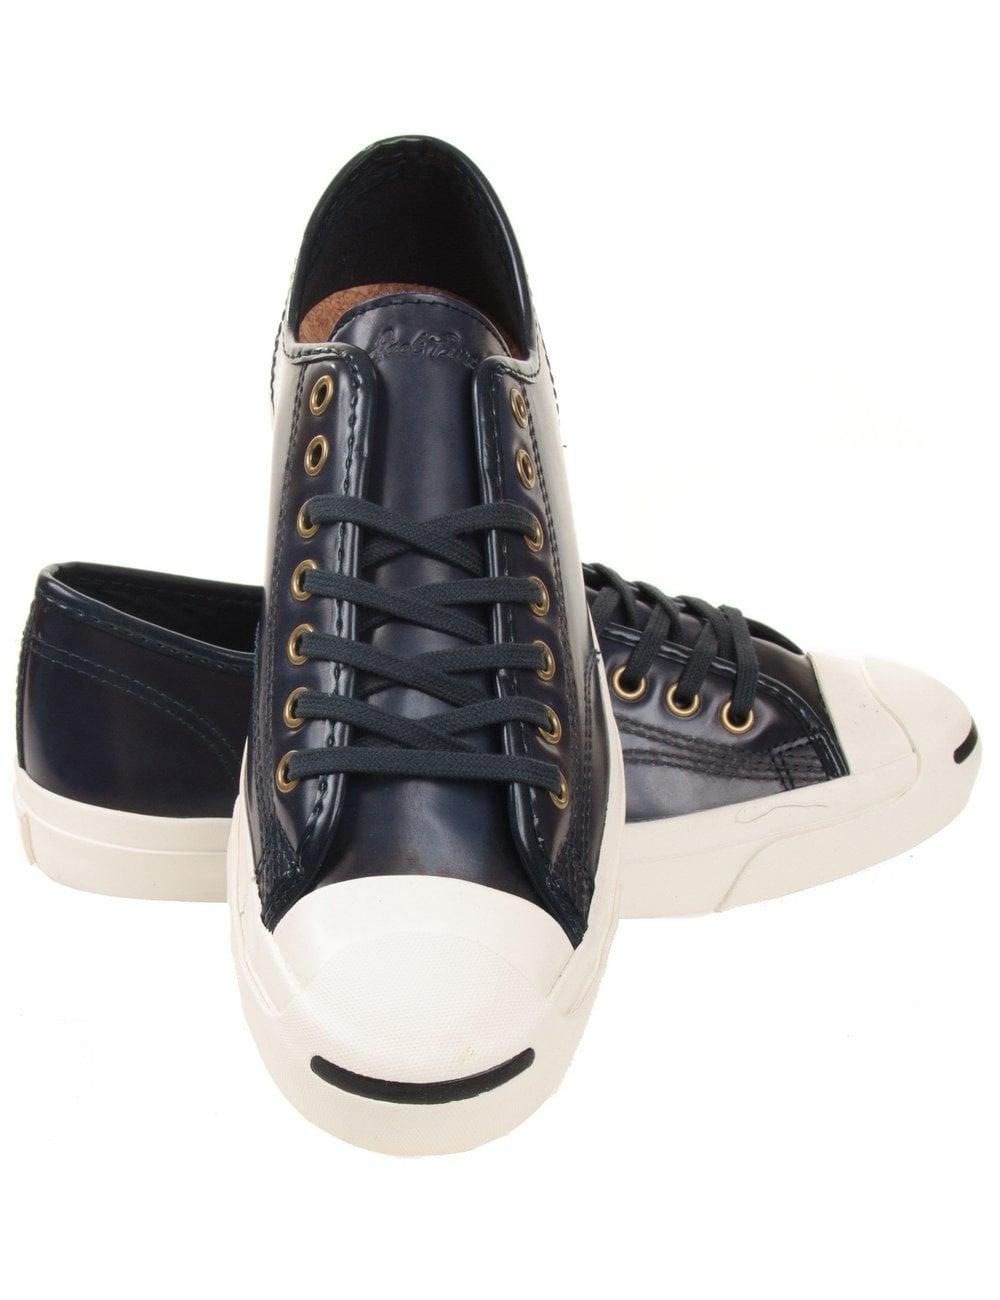 e32f3ba03f4 Converse Jack Purcell LTT OX Shoes - Victorian Blue - Footwear from ...